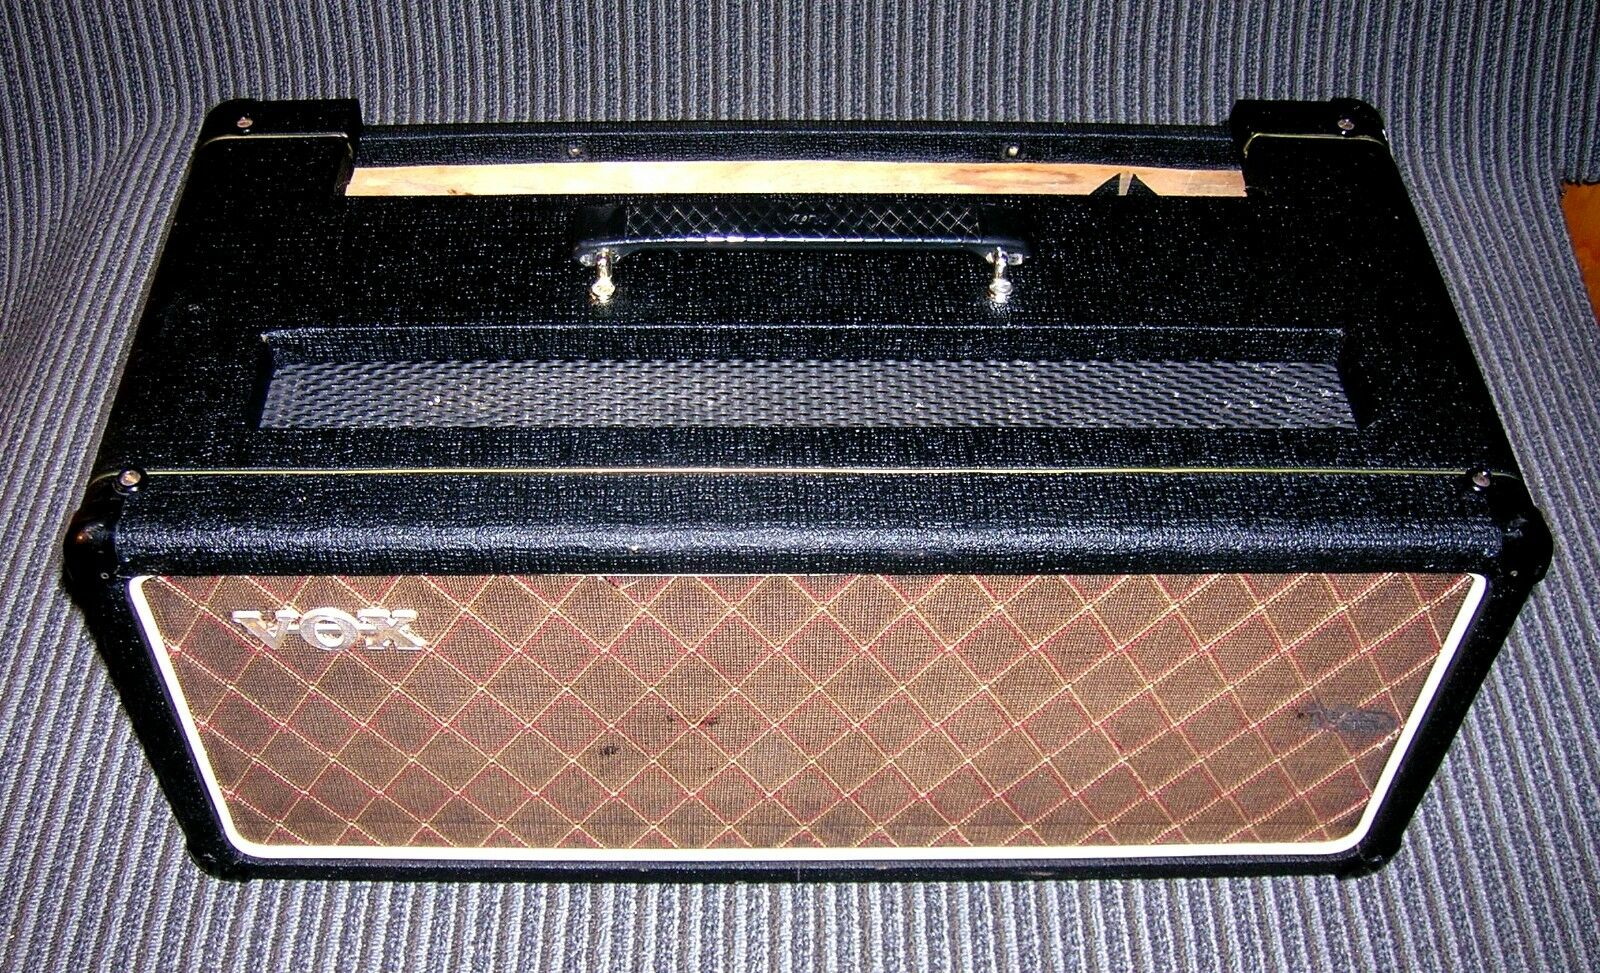 1964 Vox AC50 large box cabinet  Beatles  ALL ORIGINAL, BEAUTIFUL CONDITION